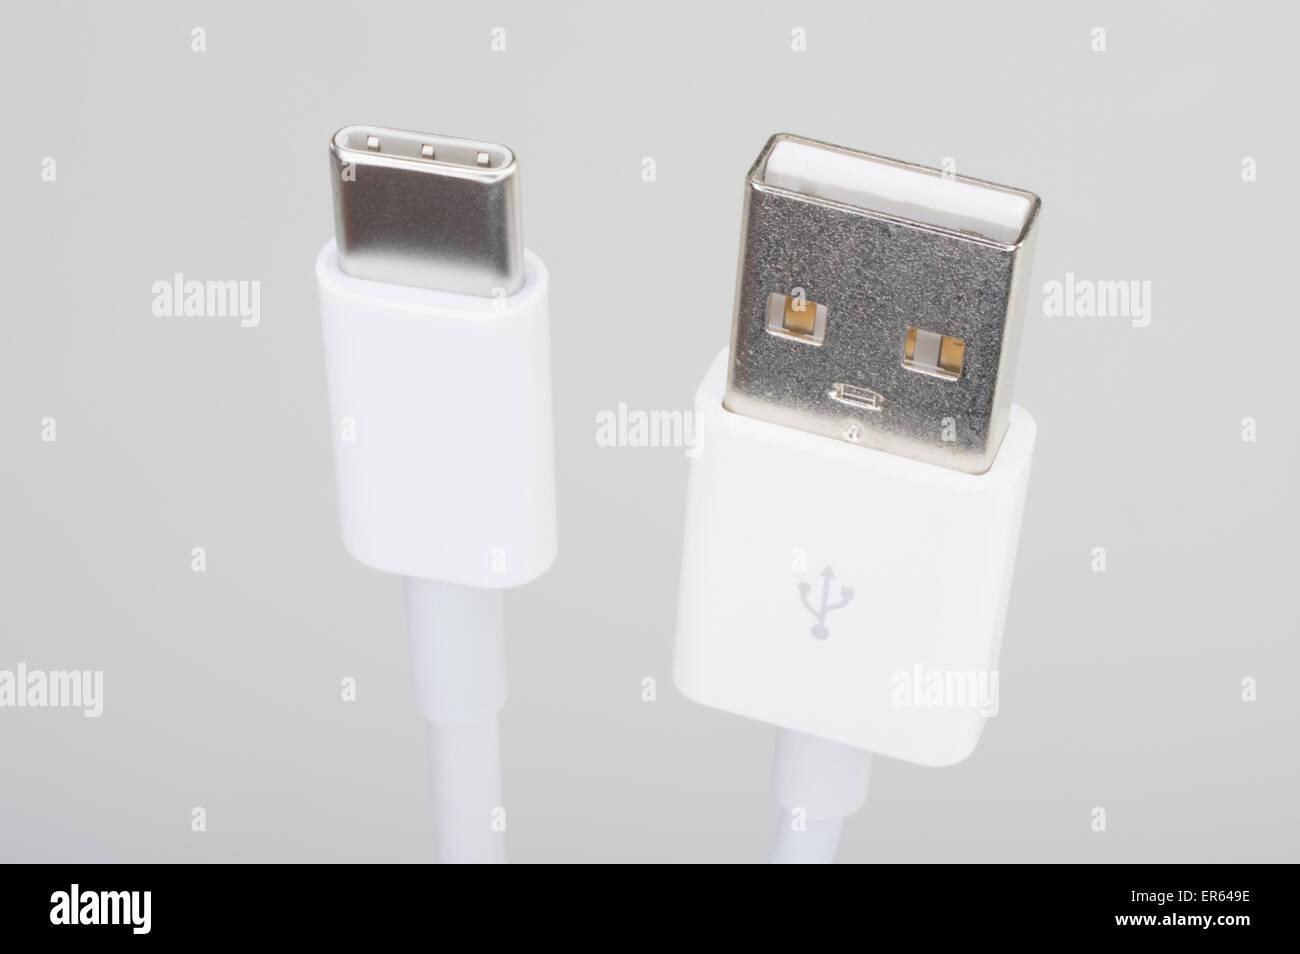 Apple USB-C USB type C connector and standard A USB plug - Stock Image